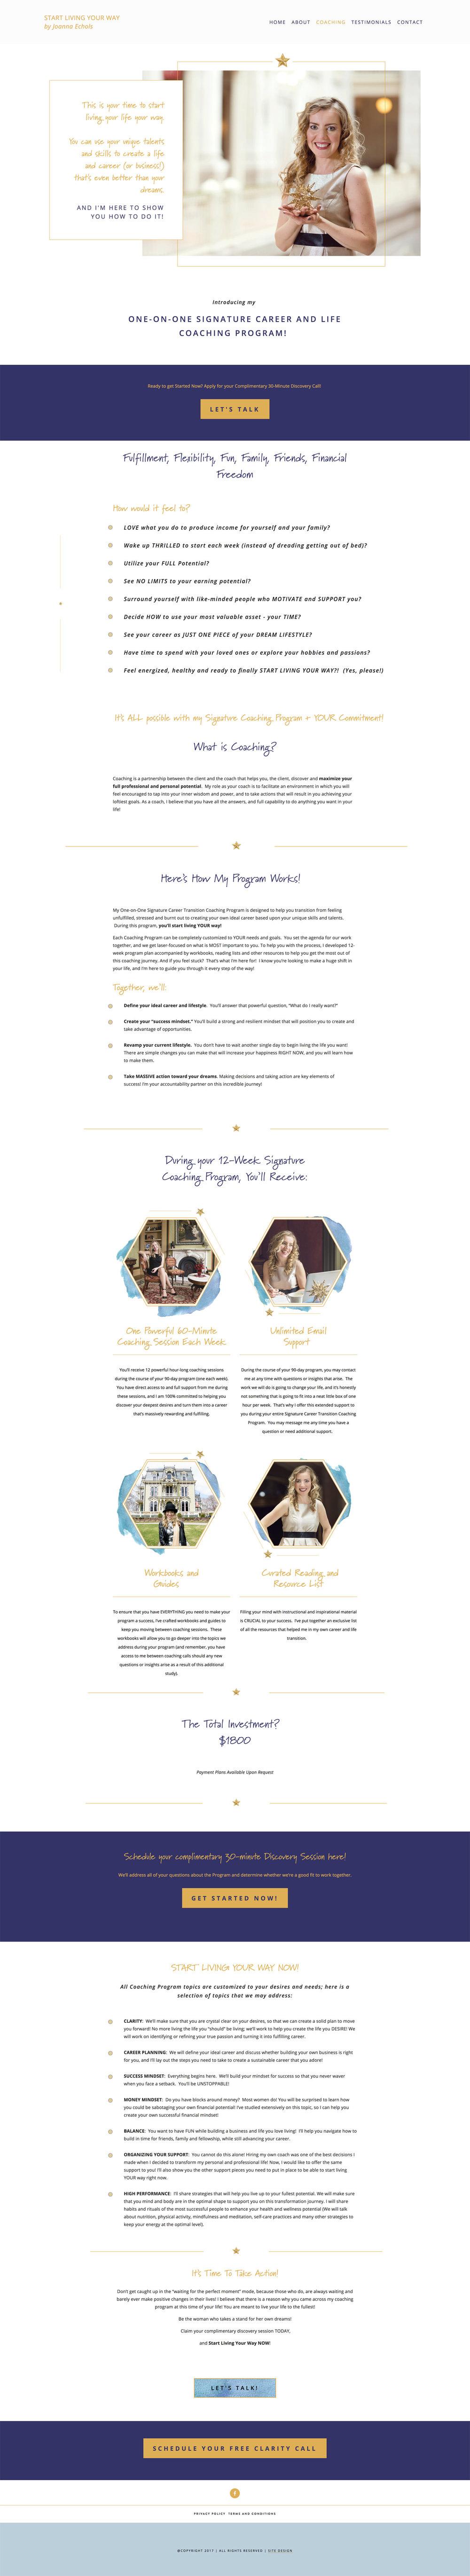 Joanna Echols Coaching page | Squarespace web design | Jodi Neufeld Design